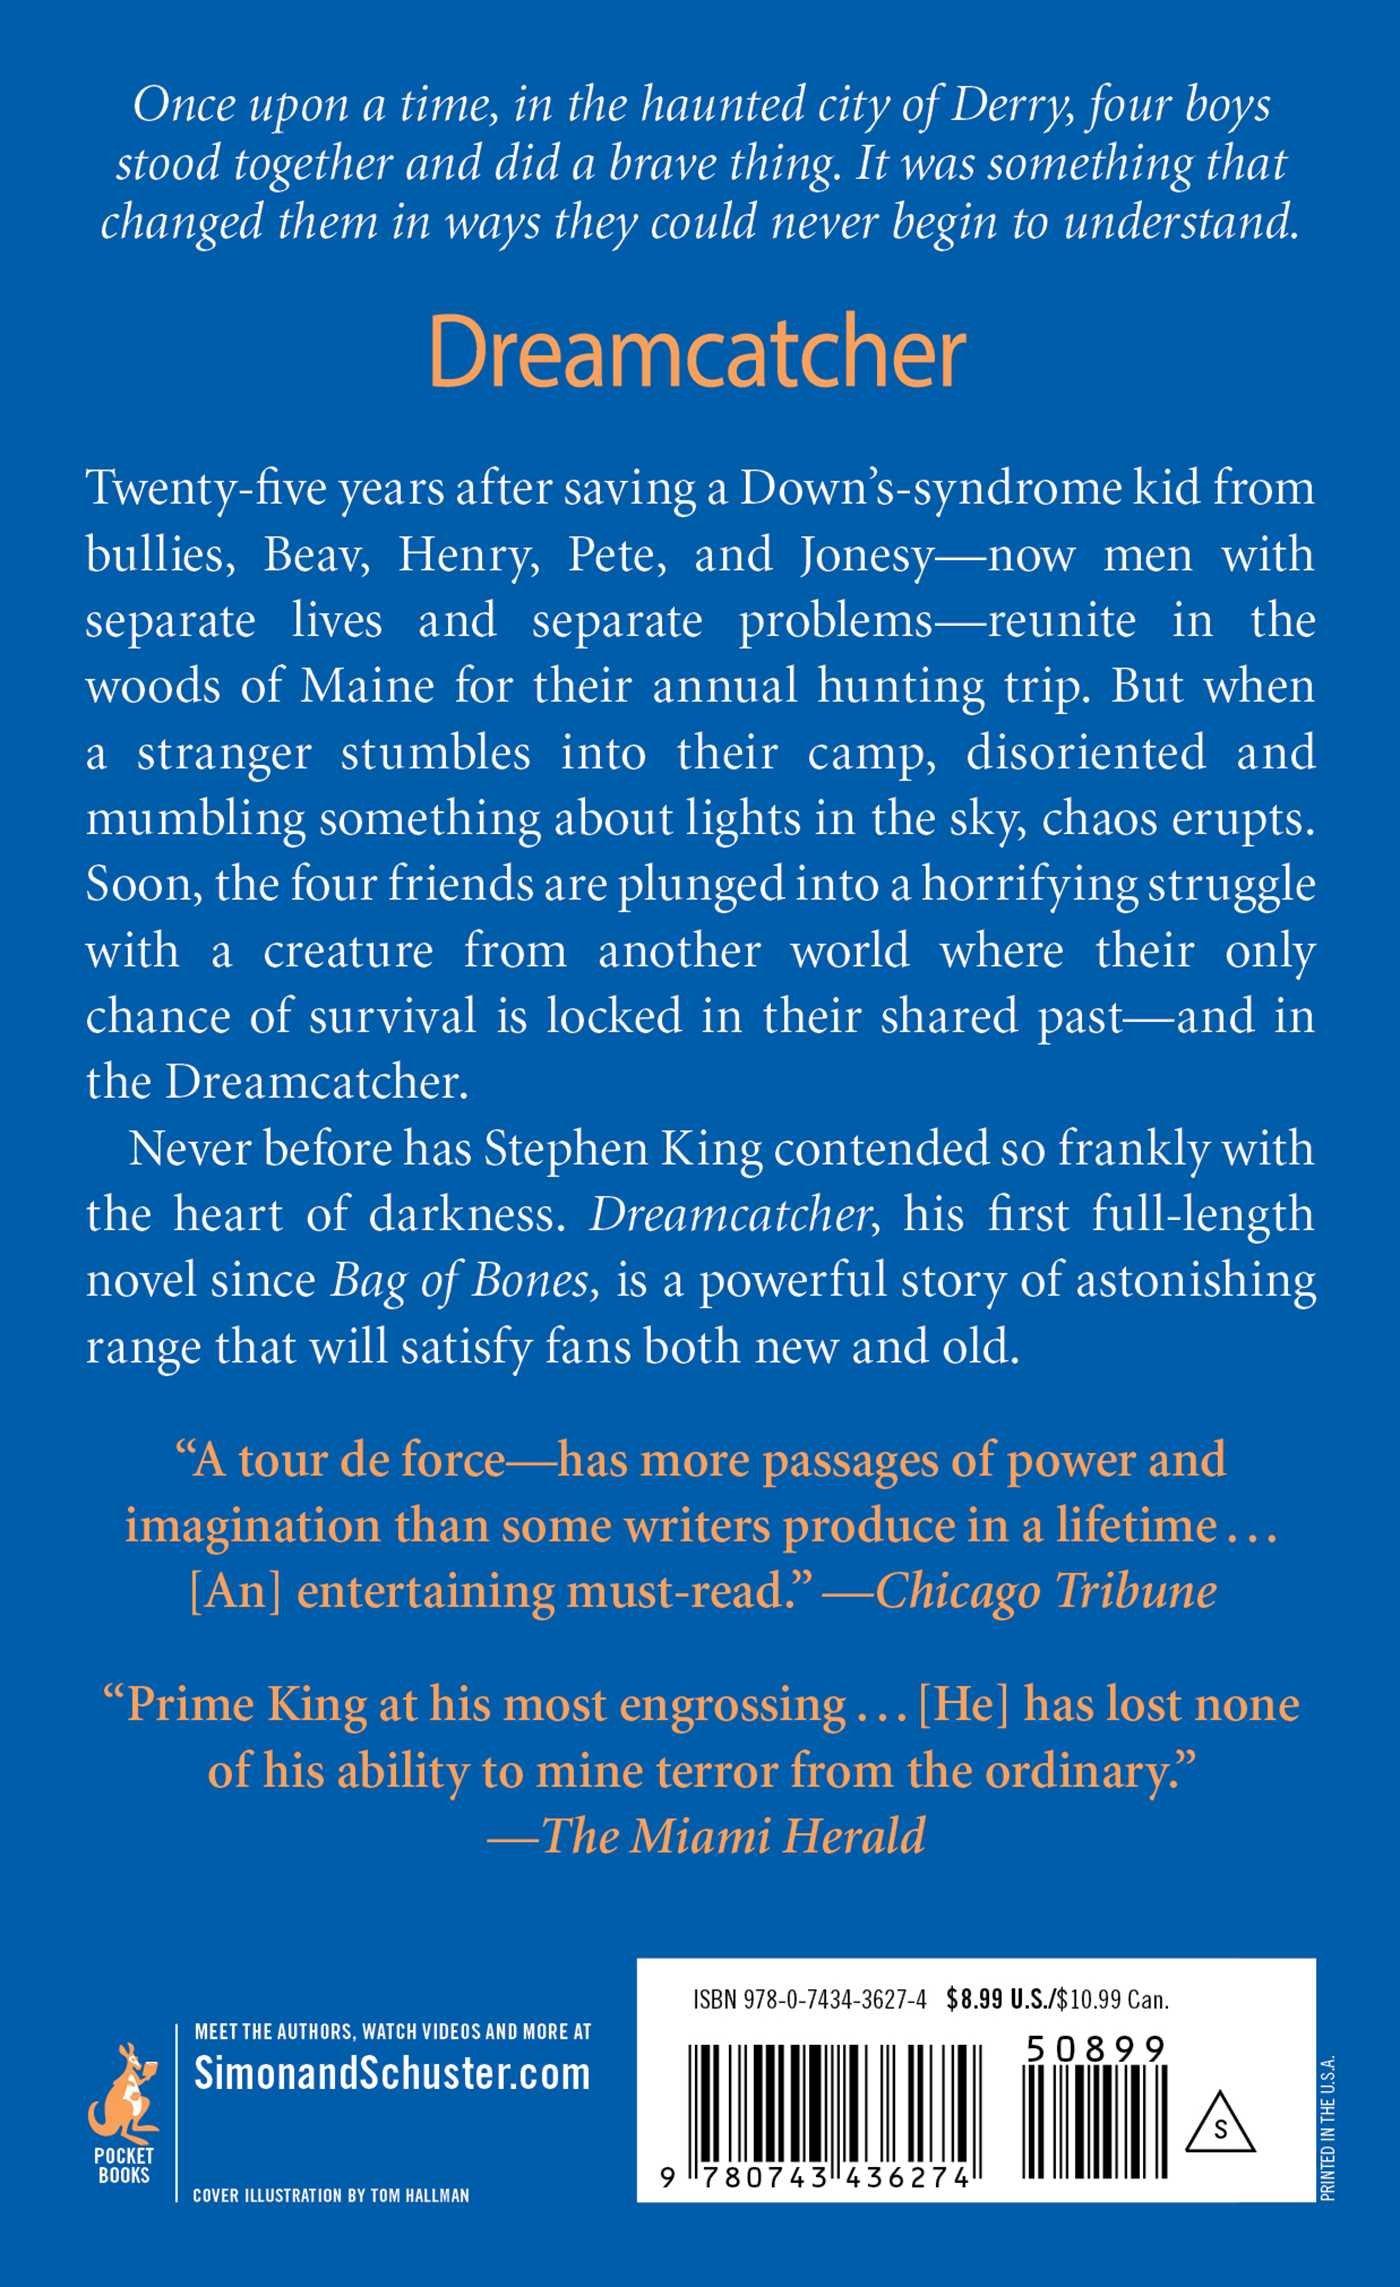 Dream Catcher Stories Dreamcatcher Stephen King 40 Amazon Books 18